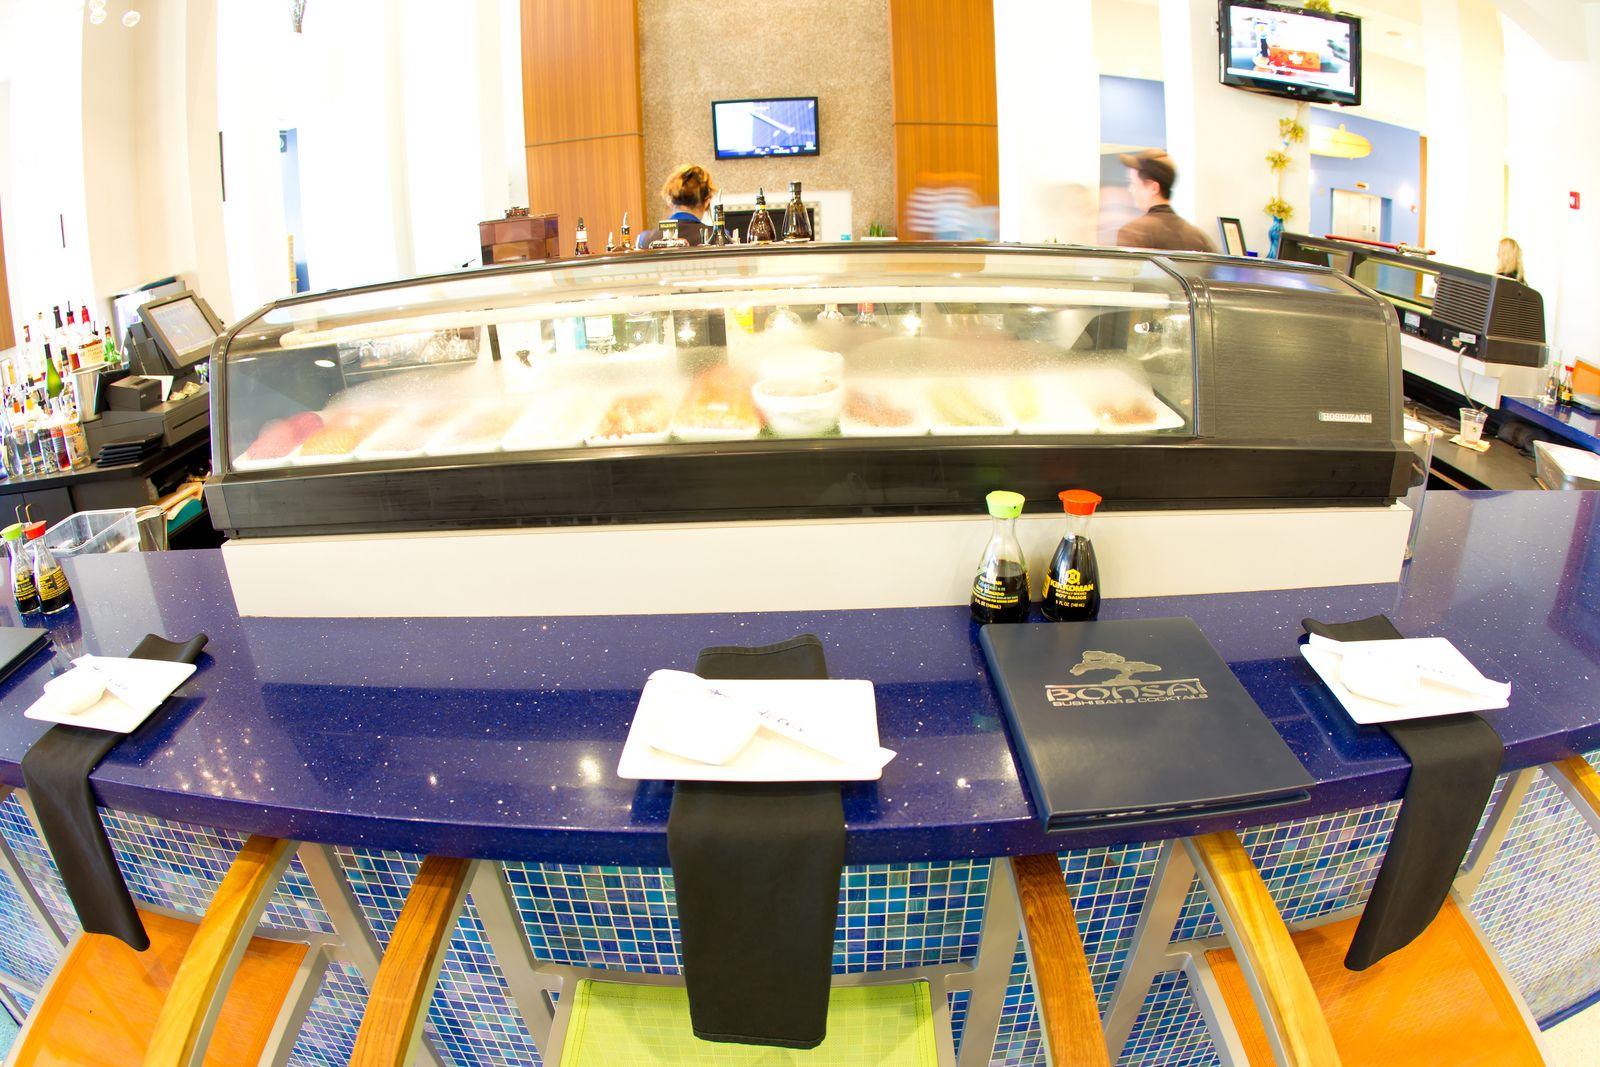 Hilton Gulf Front Beachfront Hotel In Pensacola Fl Pensacola Beach Pensacola Beach Hotels Pensacola Beach Florida